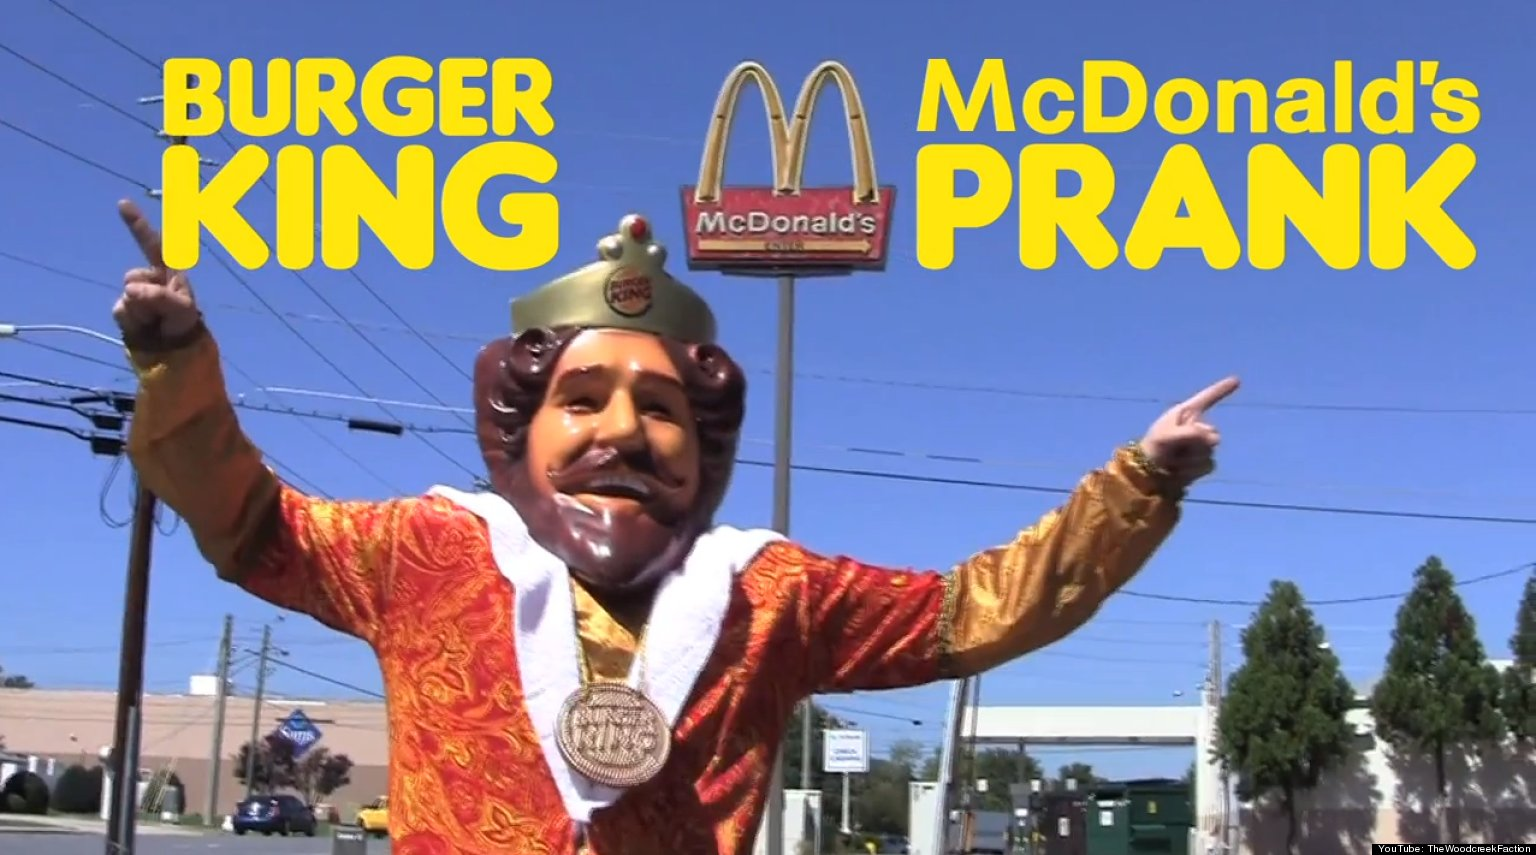 Man Dressed As Burger King Mascot Pranks Mcdonald S Video